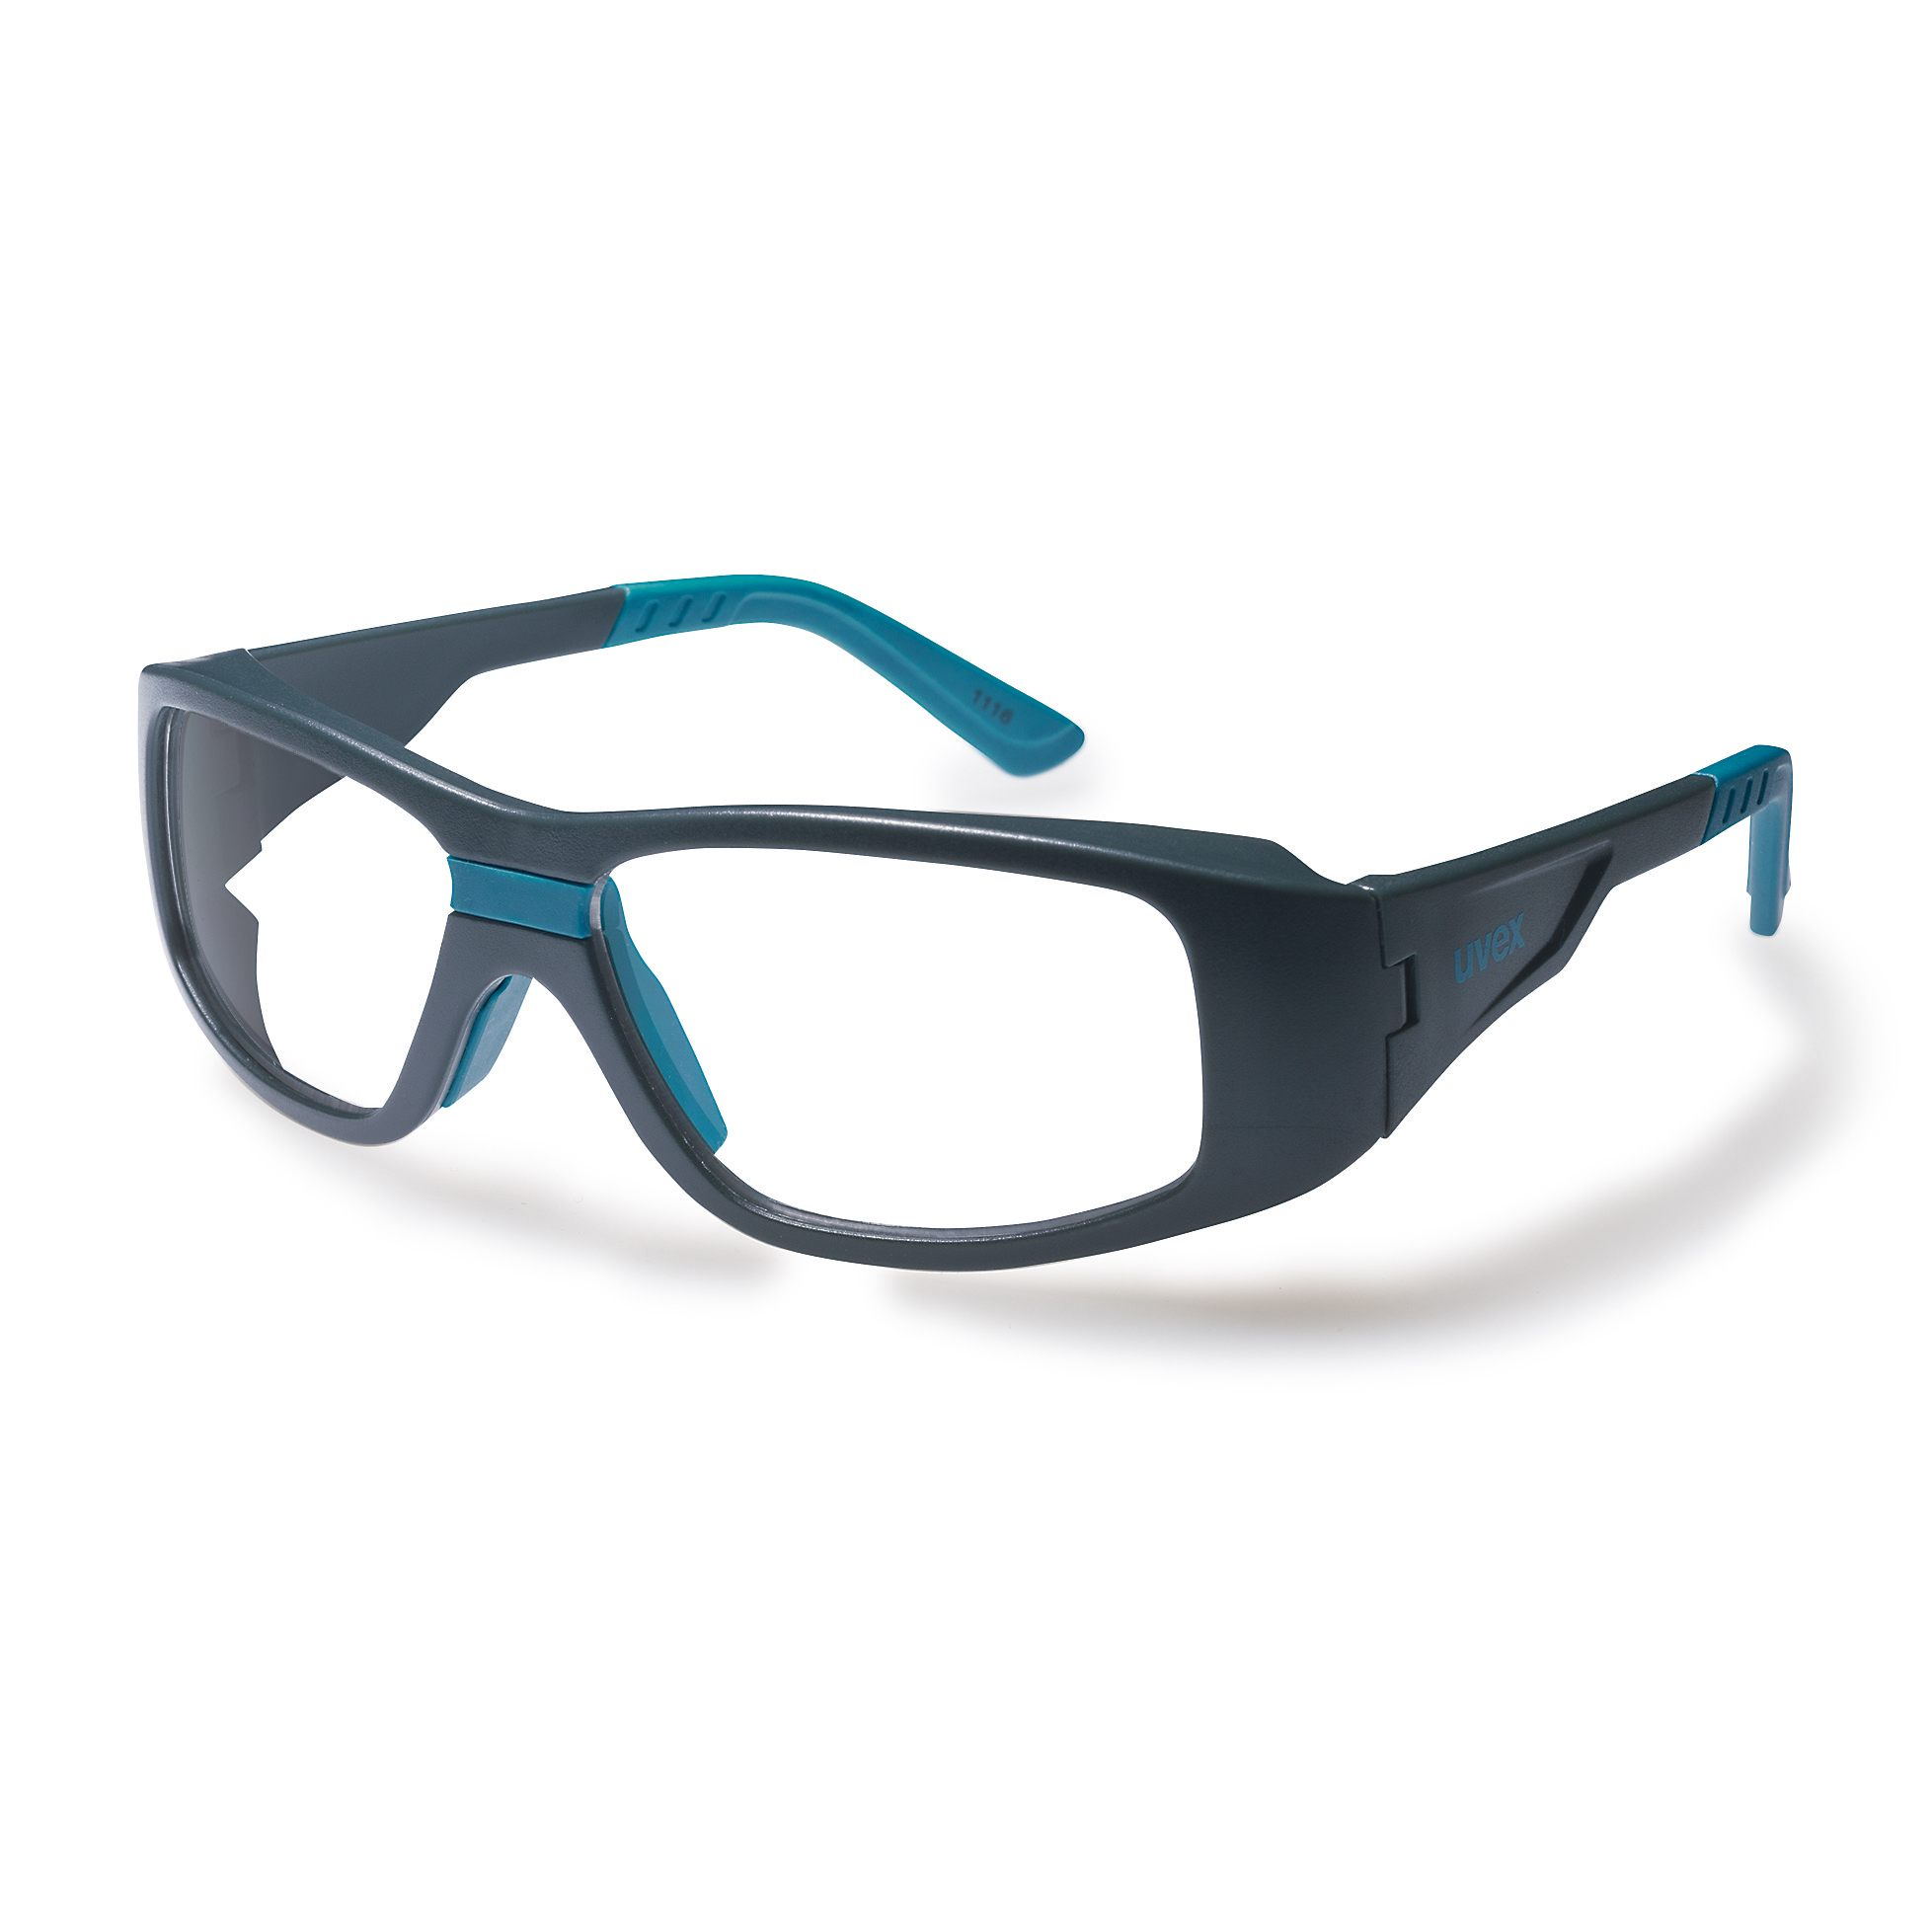 Korekcyjne okulary ochronne uvex RX sp 5510 | Osobiste